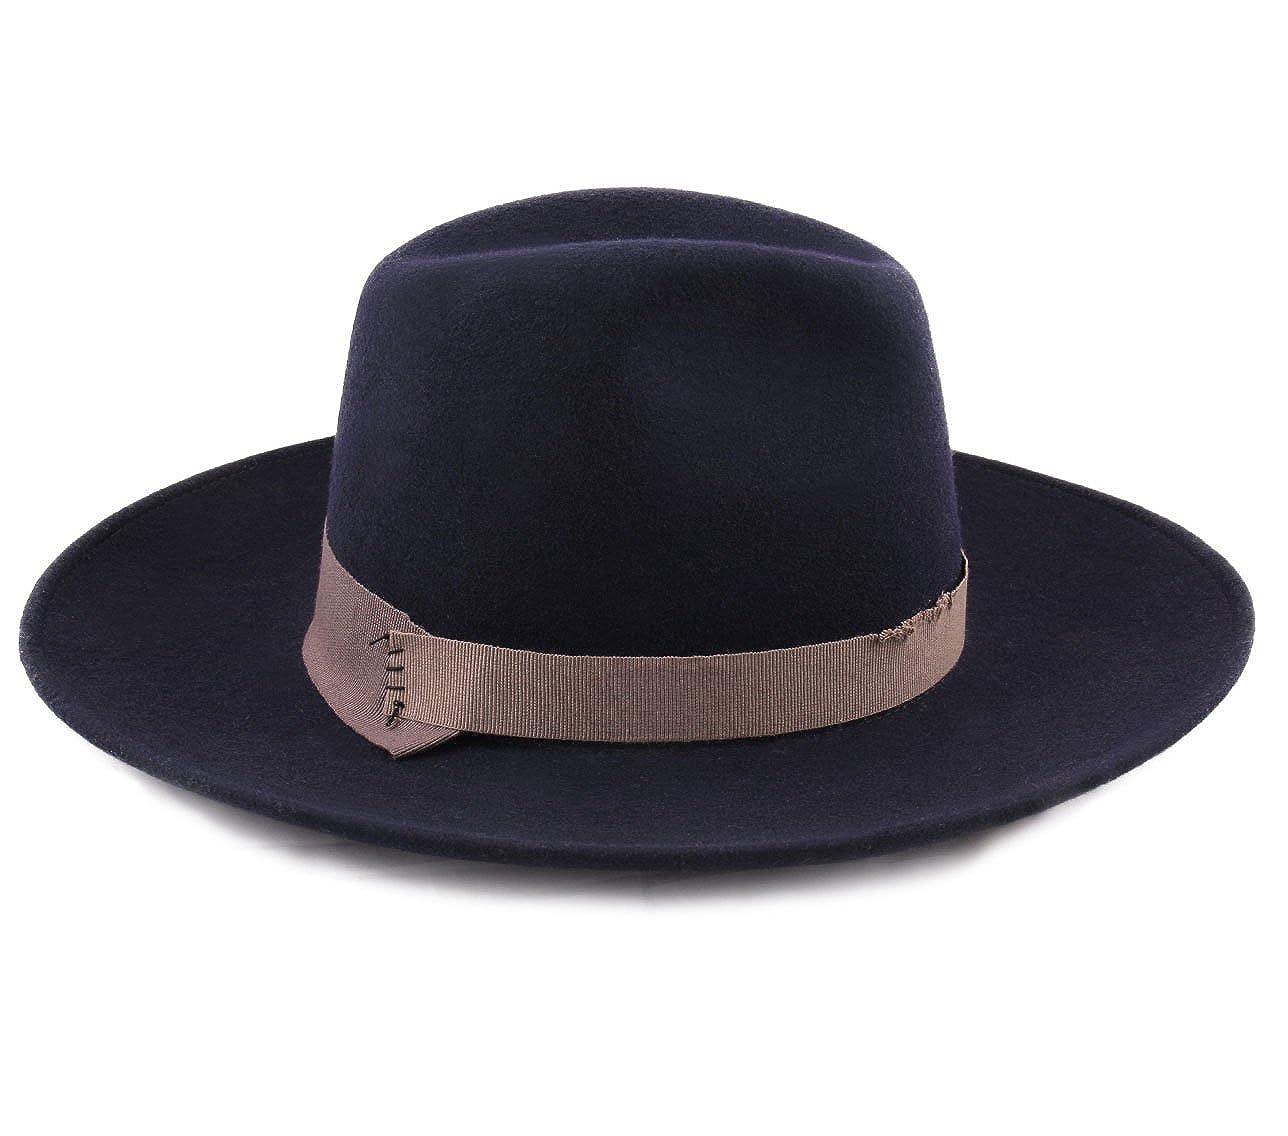 Marky LEnt/êt/é Wool Felt Fedora Hat Packable Water Repellent Wide Brim